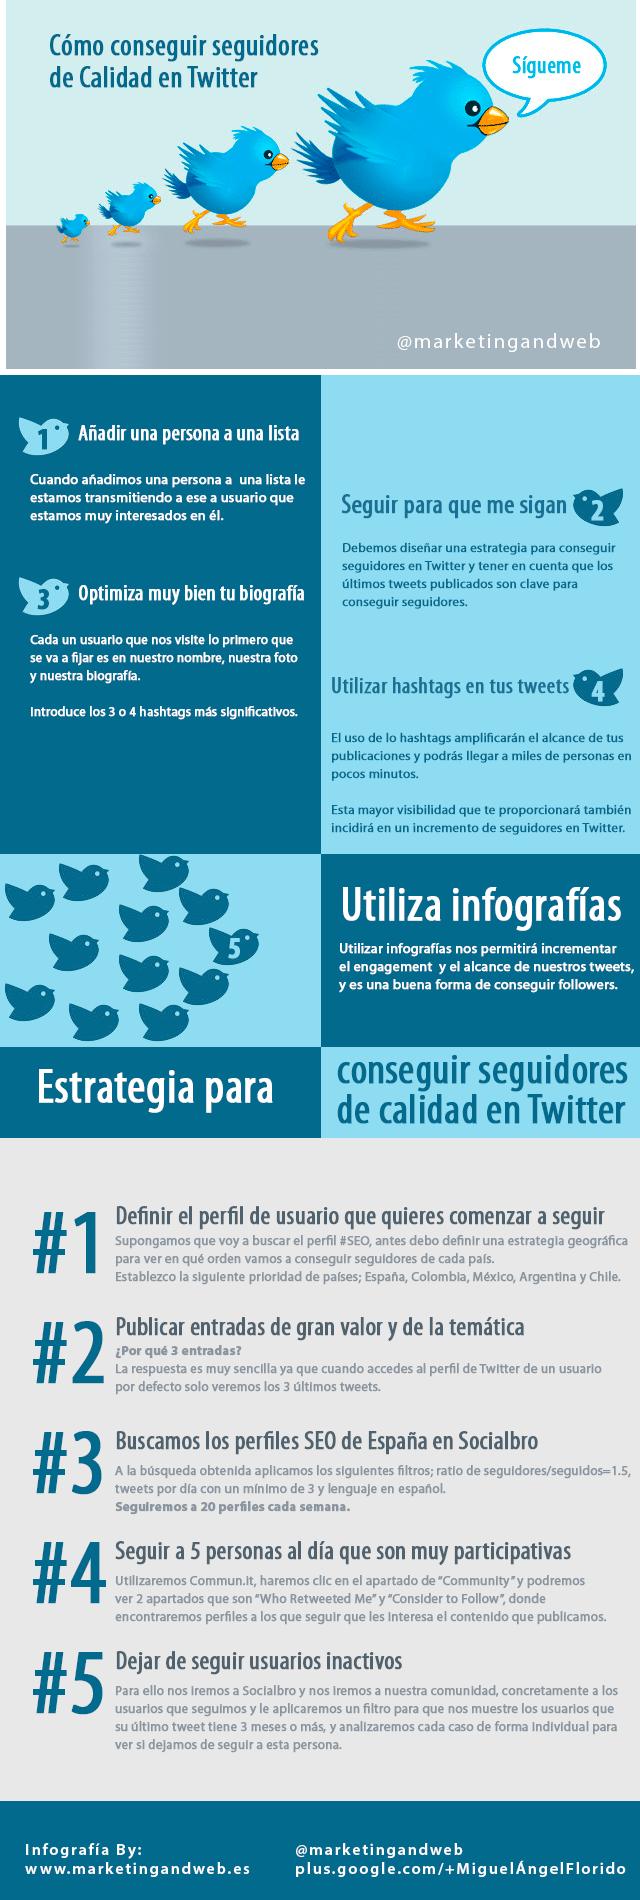 #Infografia #CommunityManager Cómo conseguir seguidores de calidad en twitter. #TAVnews